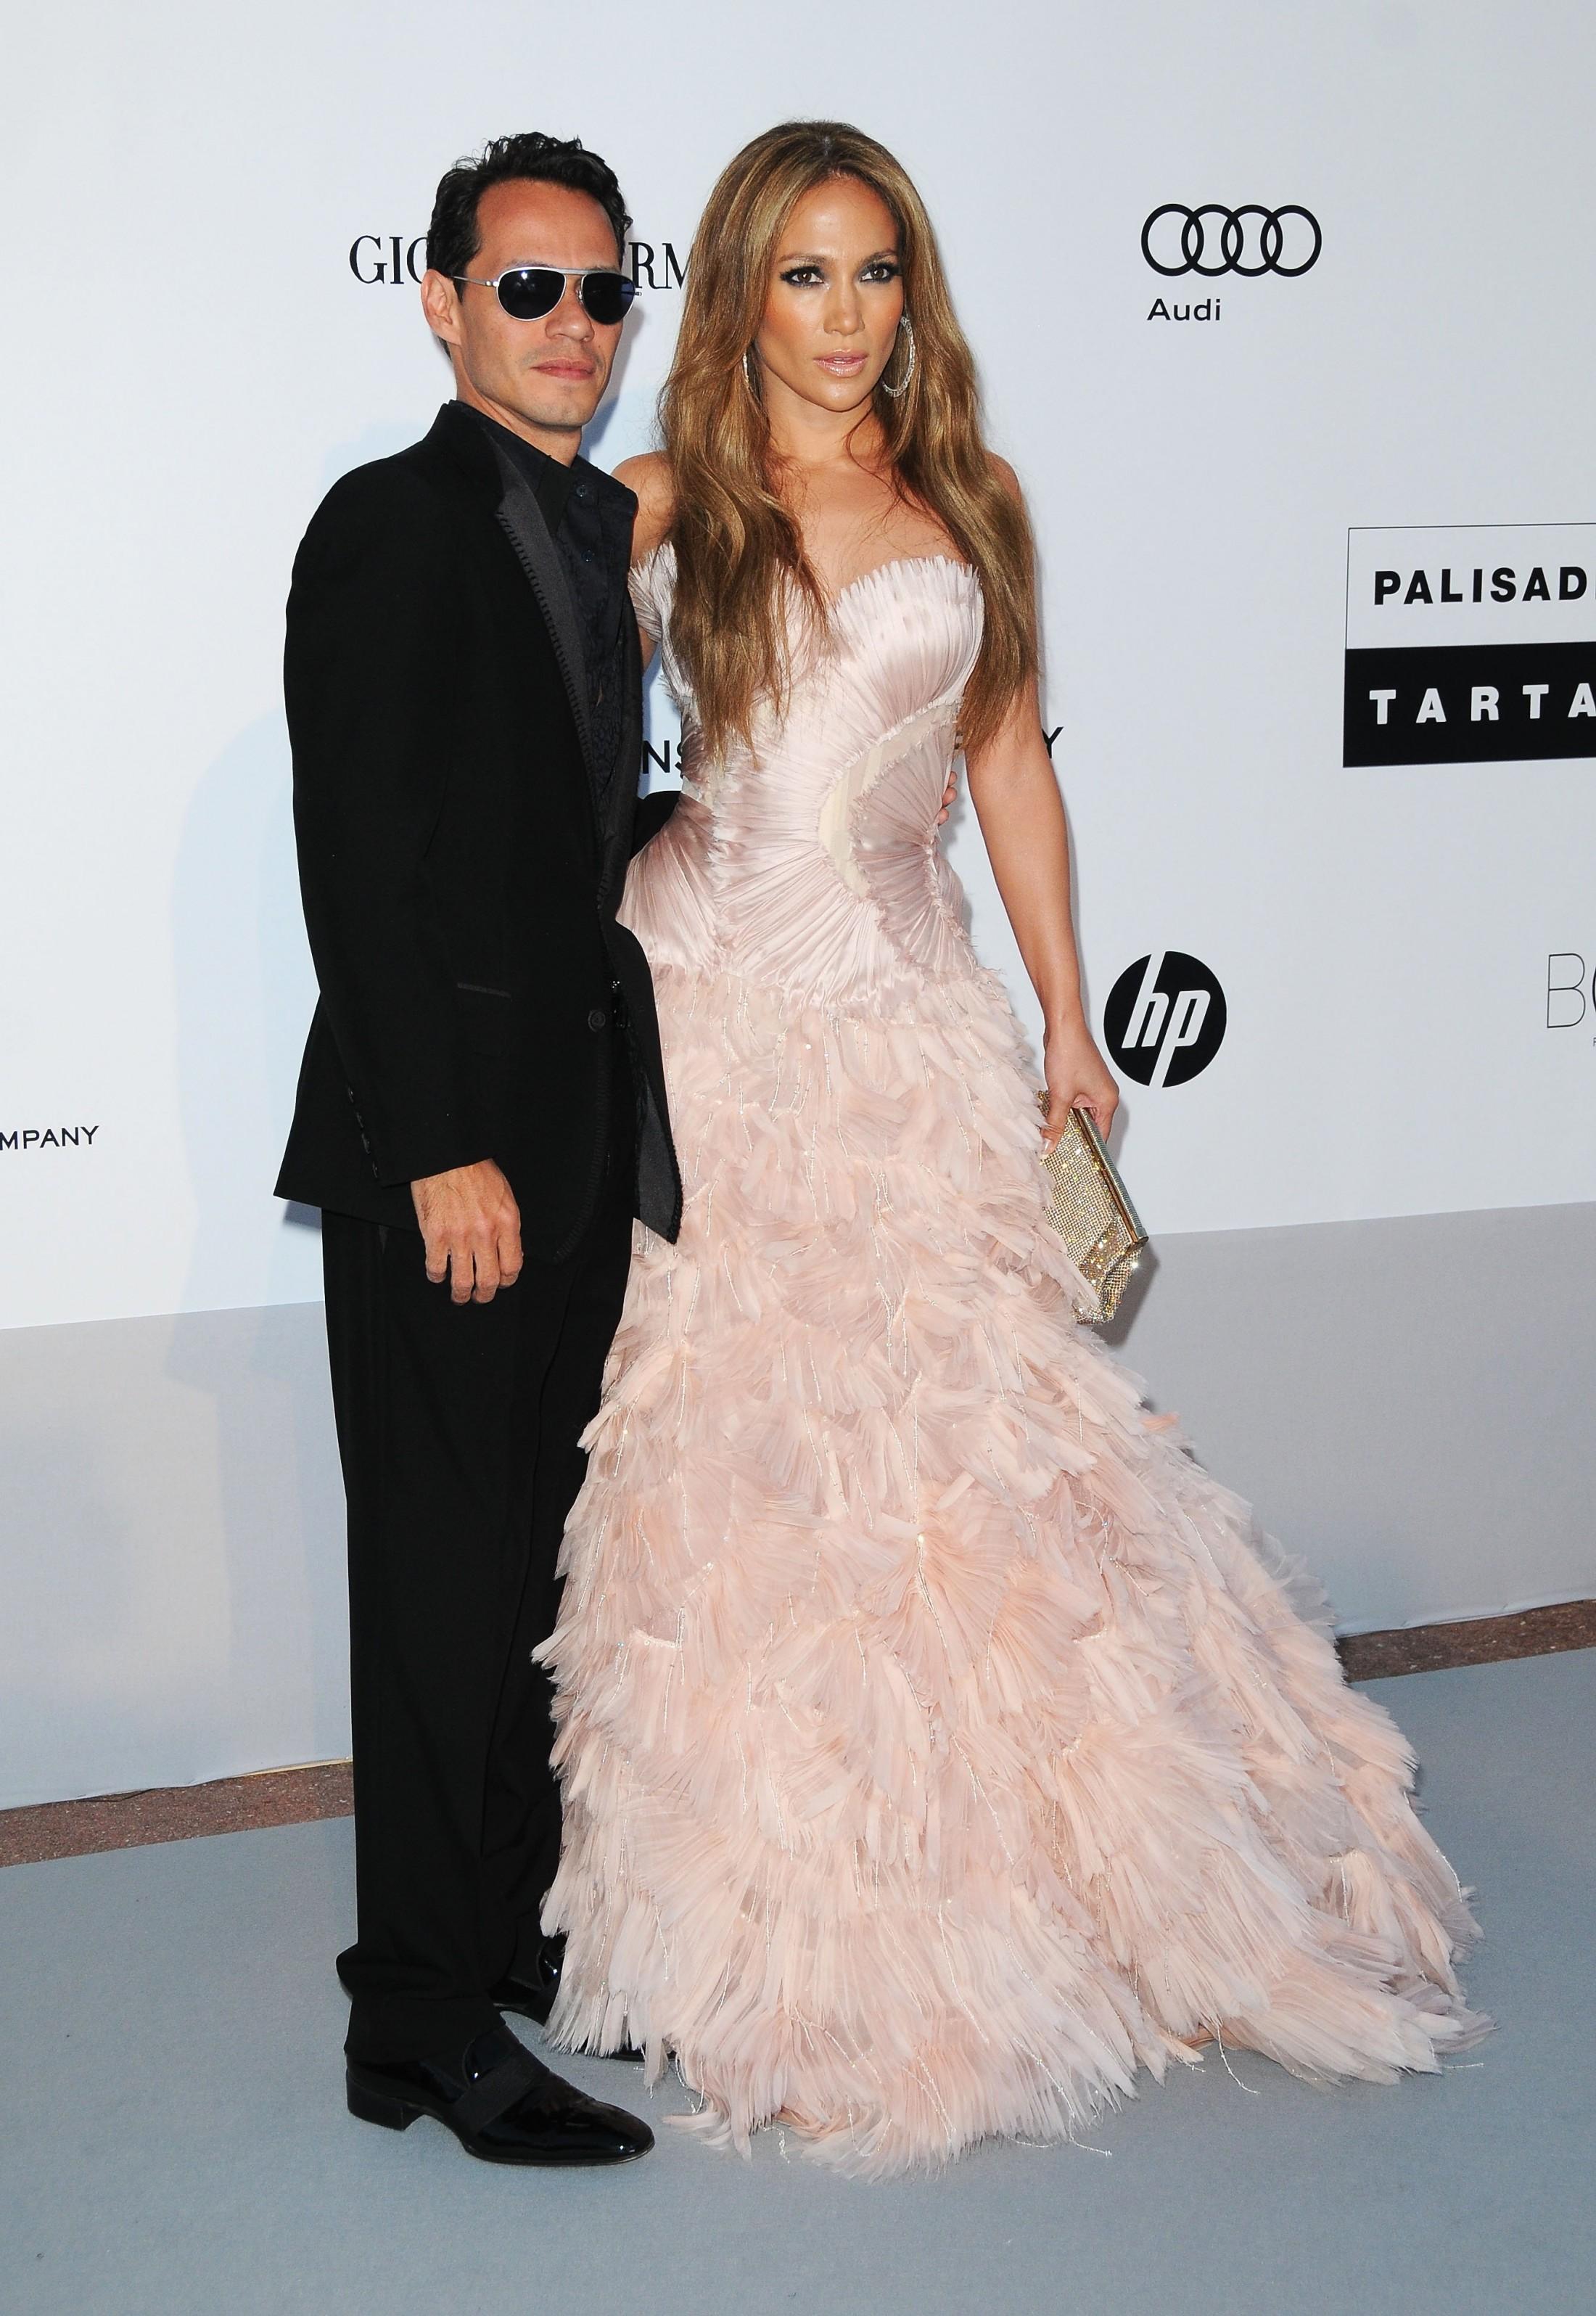 Jennifer Lopez 2010 : jennifer-lopez-at-amfars-cinema-against-aids-2010-benefit-gala-03